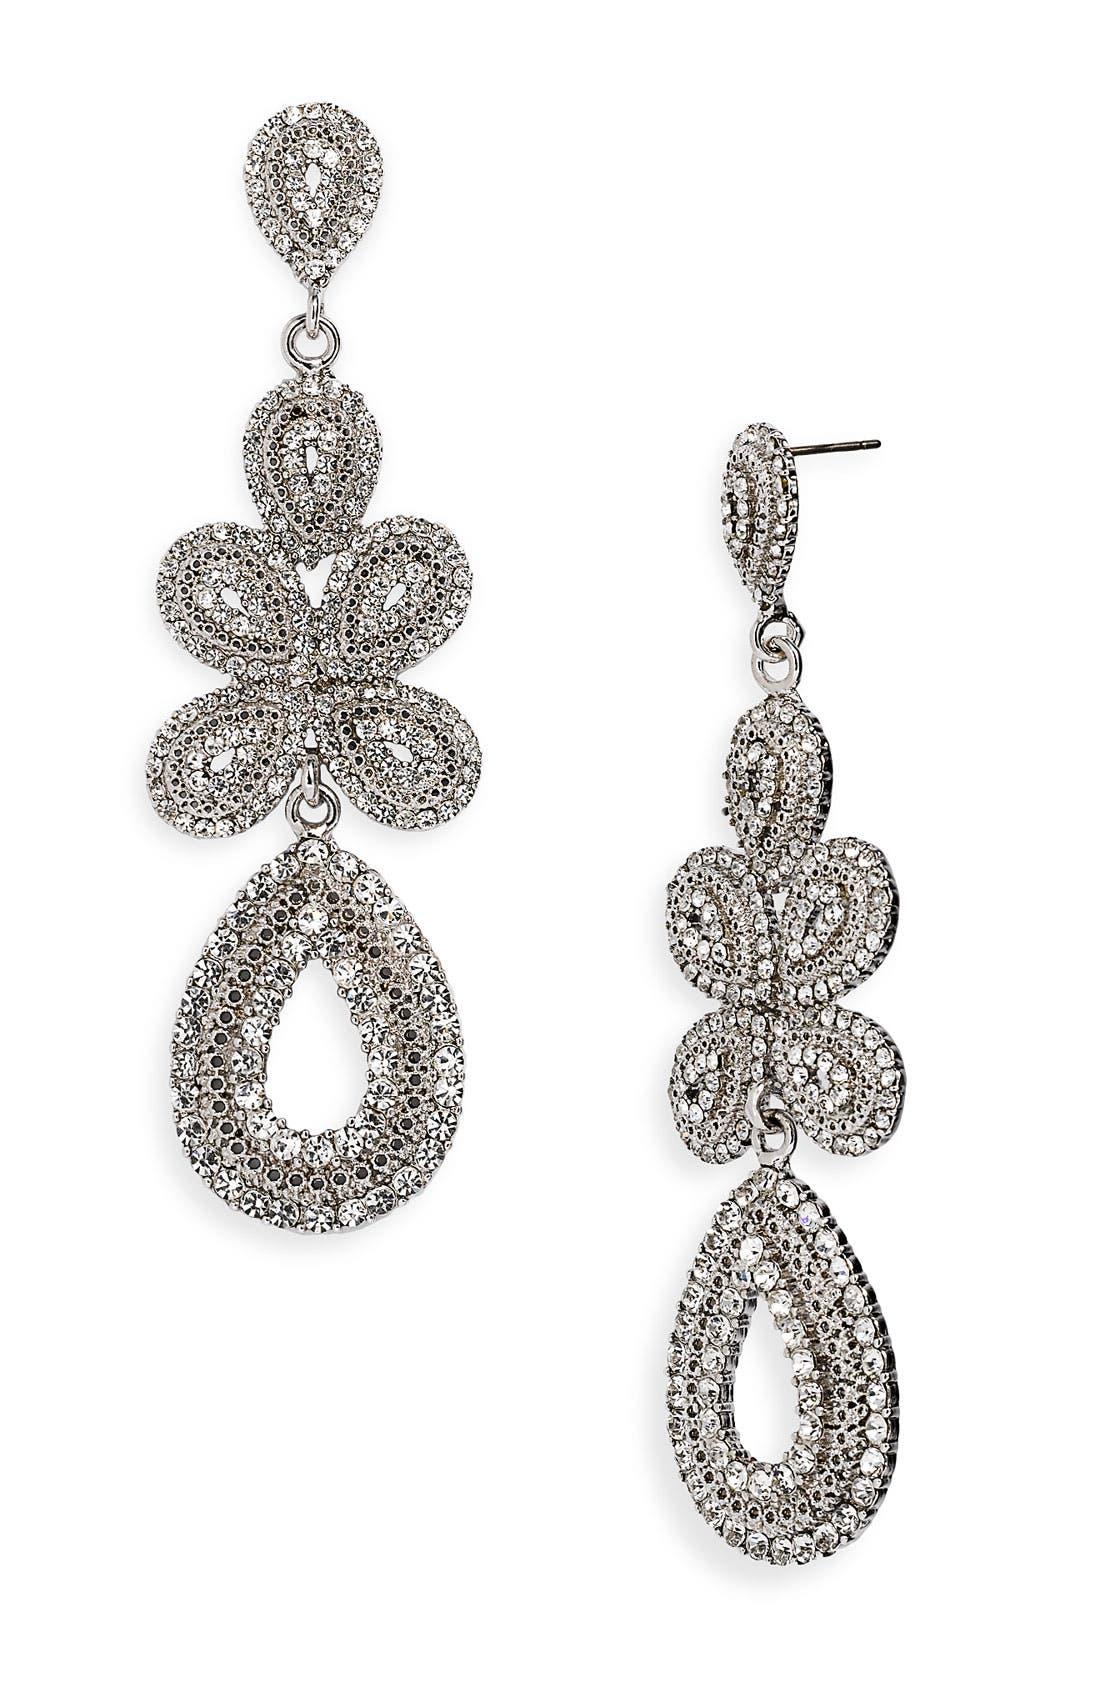 Main Image - Tasha 'Ornate' Linear Statement Earrings